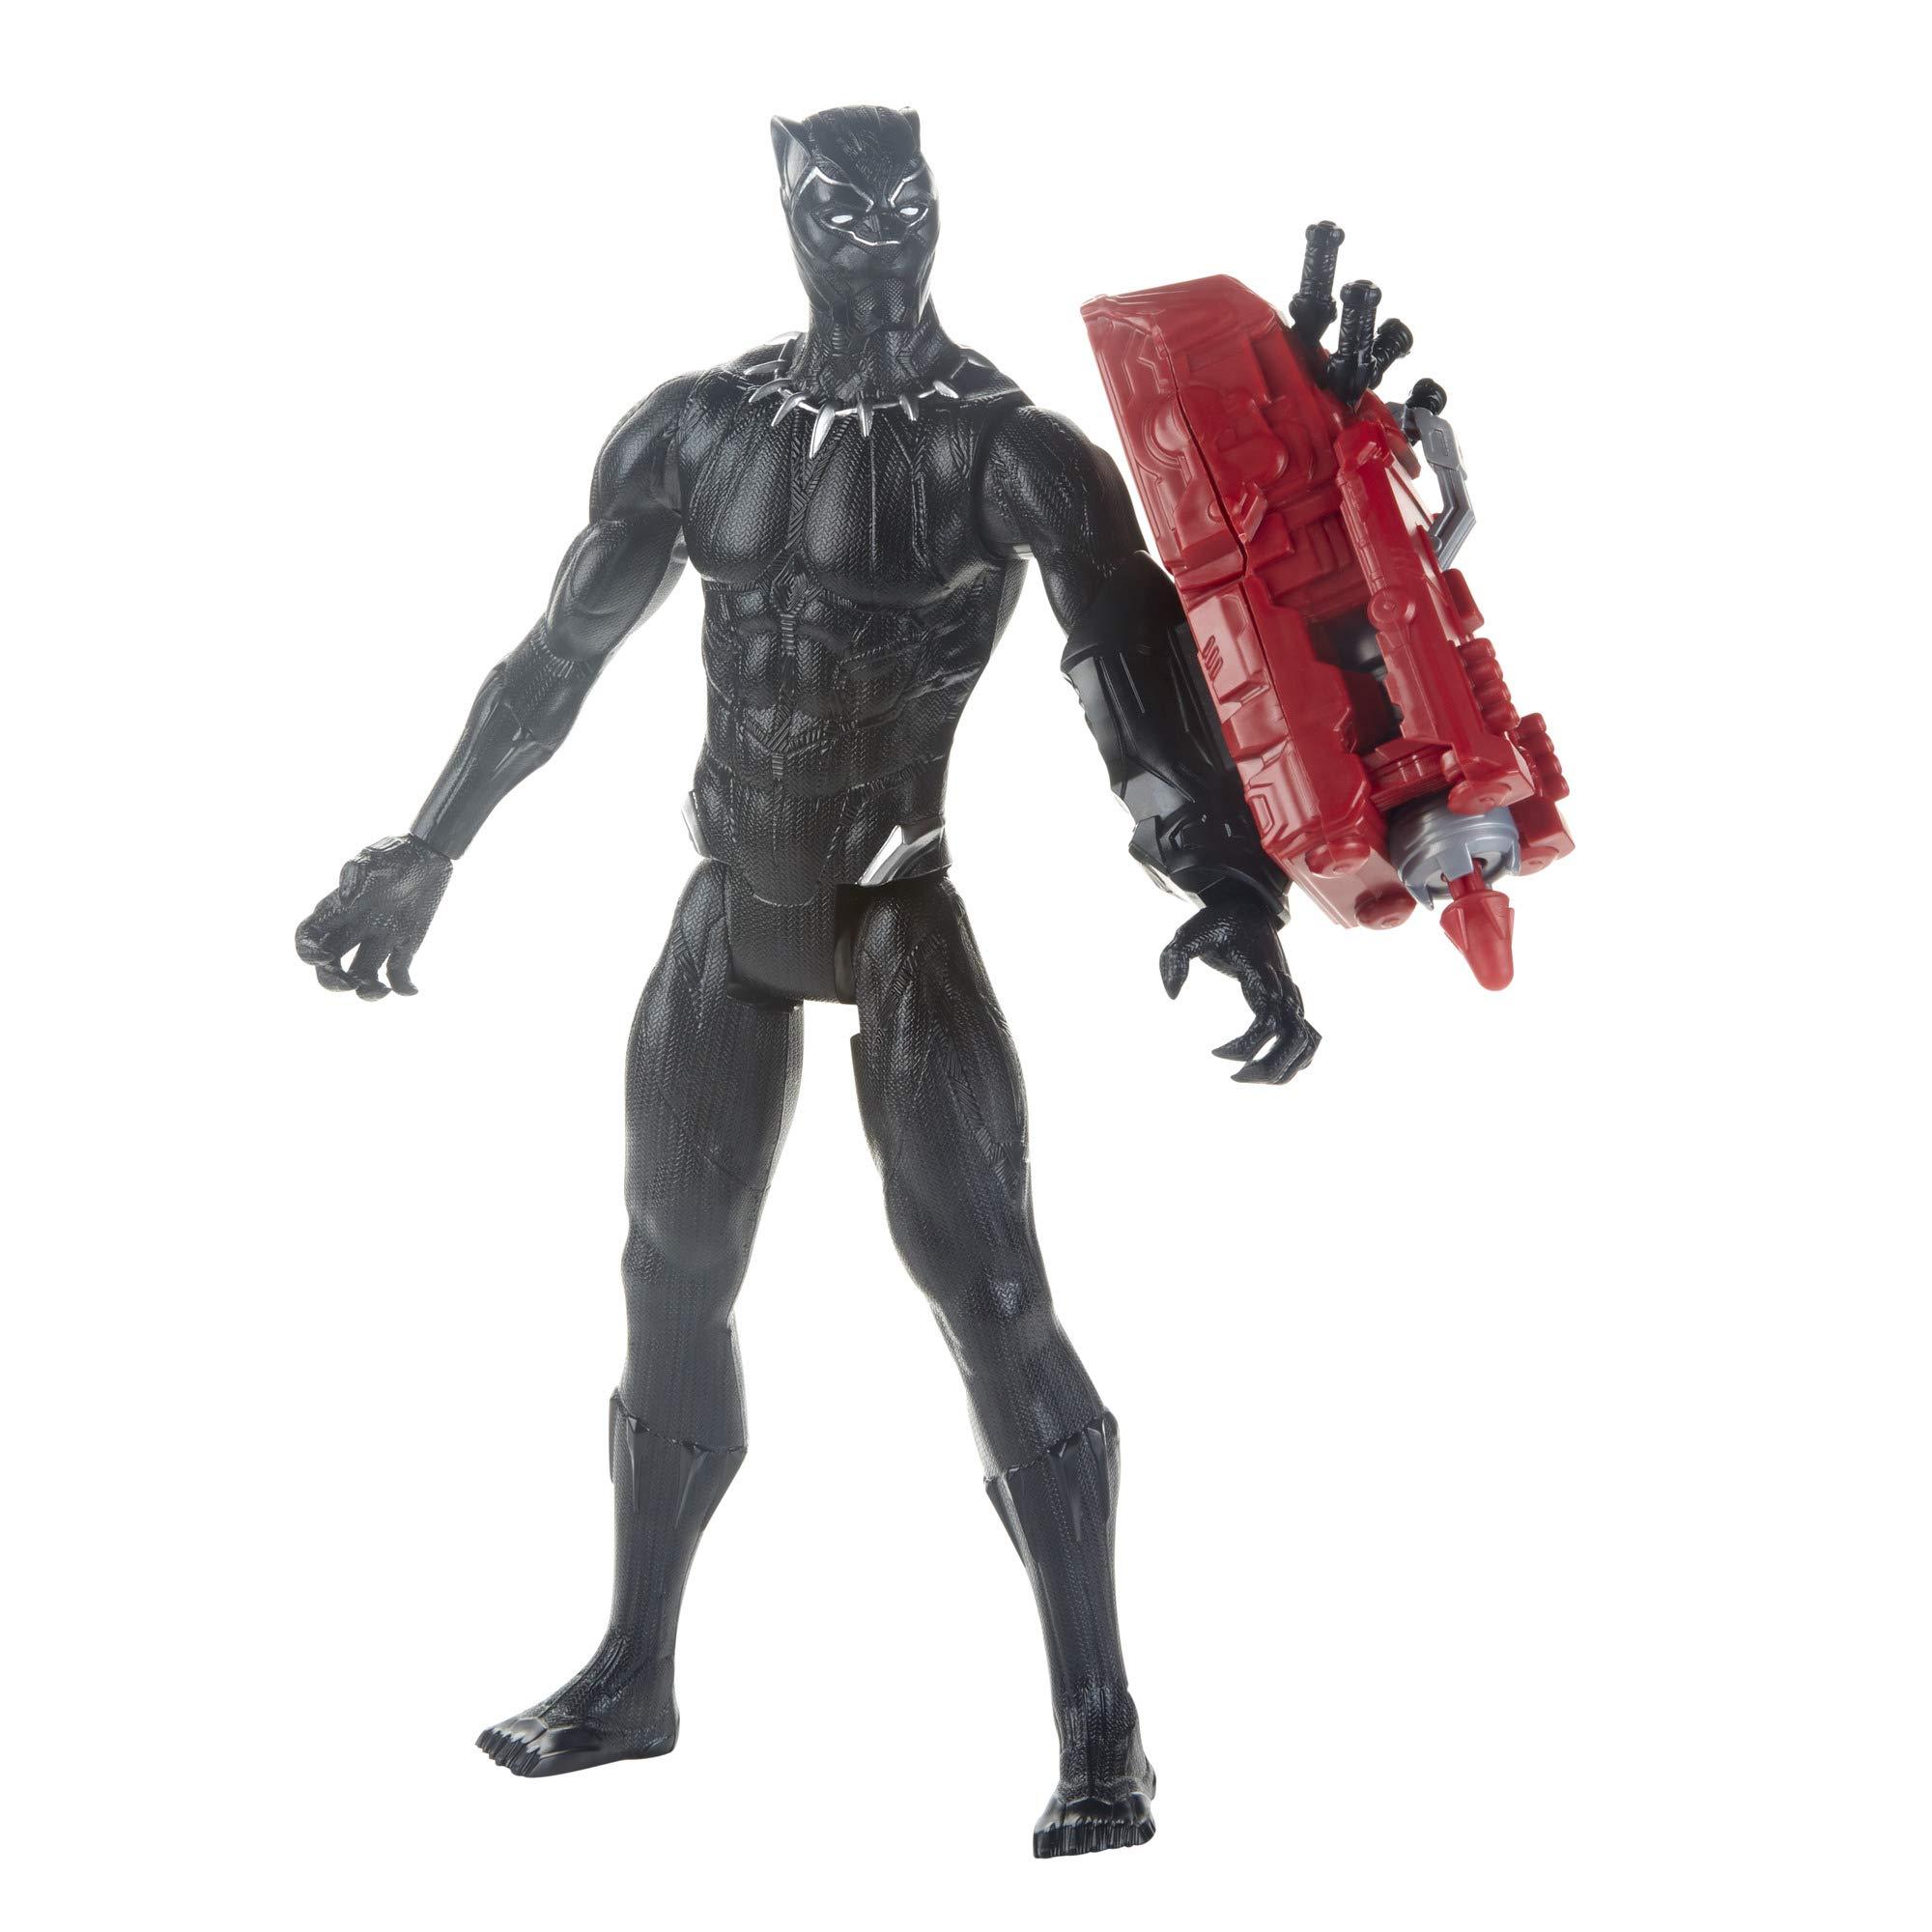 "Avengers Marvel Endgame Titan Hero Series Black Panther 12"" Action Figure, Brown/A"